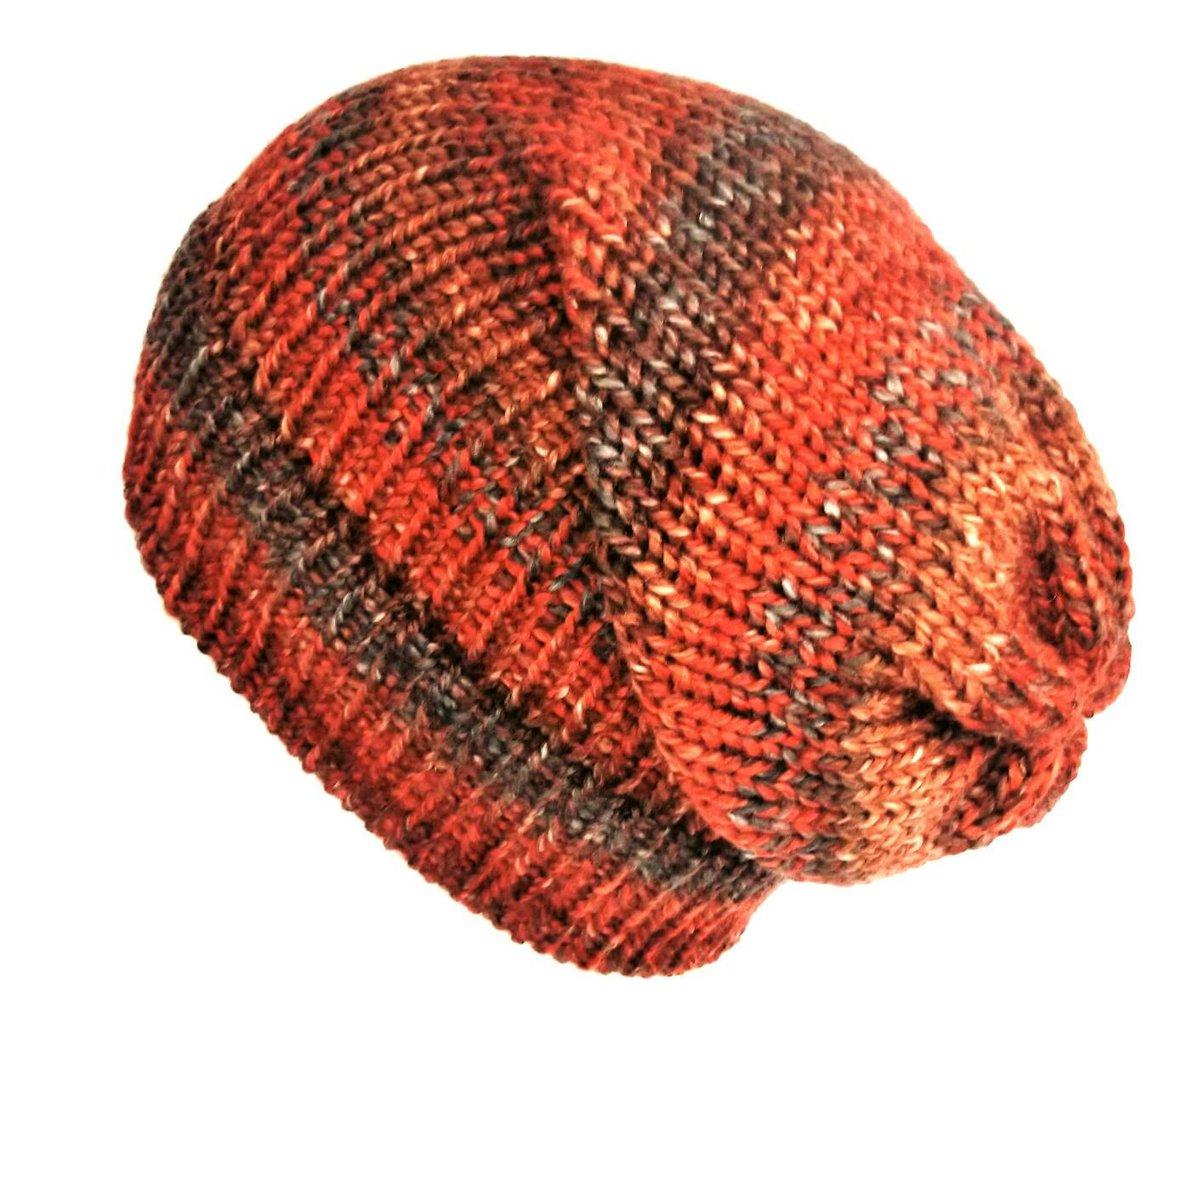 Burnt orange beanie winter knit slouchy hat, soft vegan wool hat women slouchy beanie, ladies winter hat fits adults & teens, 90s grunge https://etsy.me/2NjrS31 #Veganfashion #Lelsloom #Knittedhats #Vegan #Etsy #Handmadehour #Shopping #90sGrungepic.twitter.com/dfg3CuVF5z